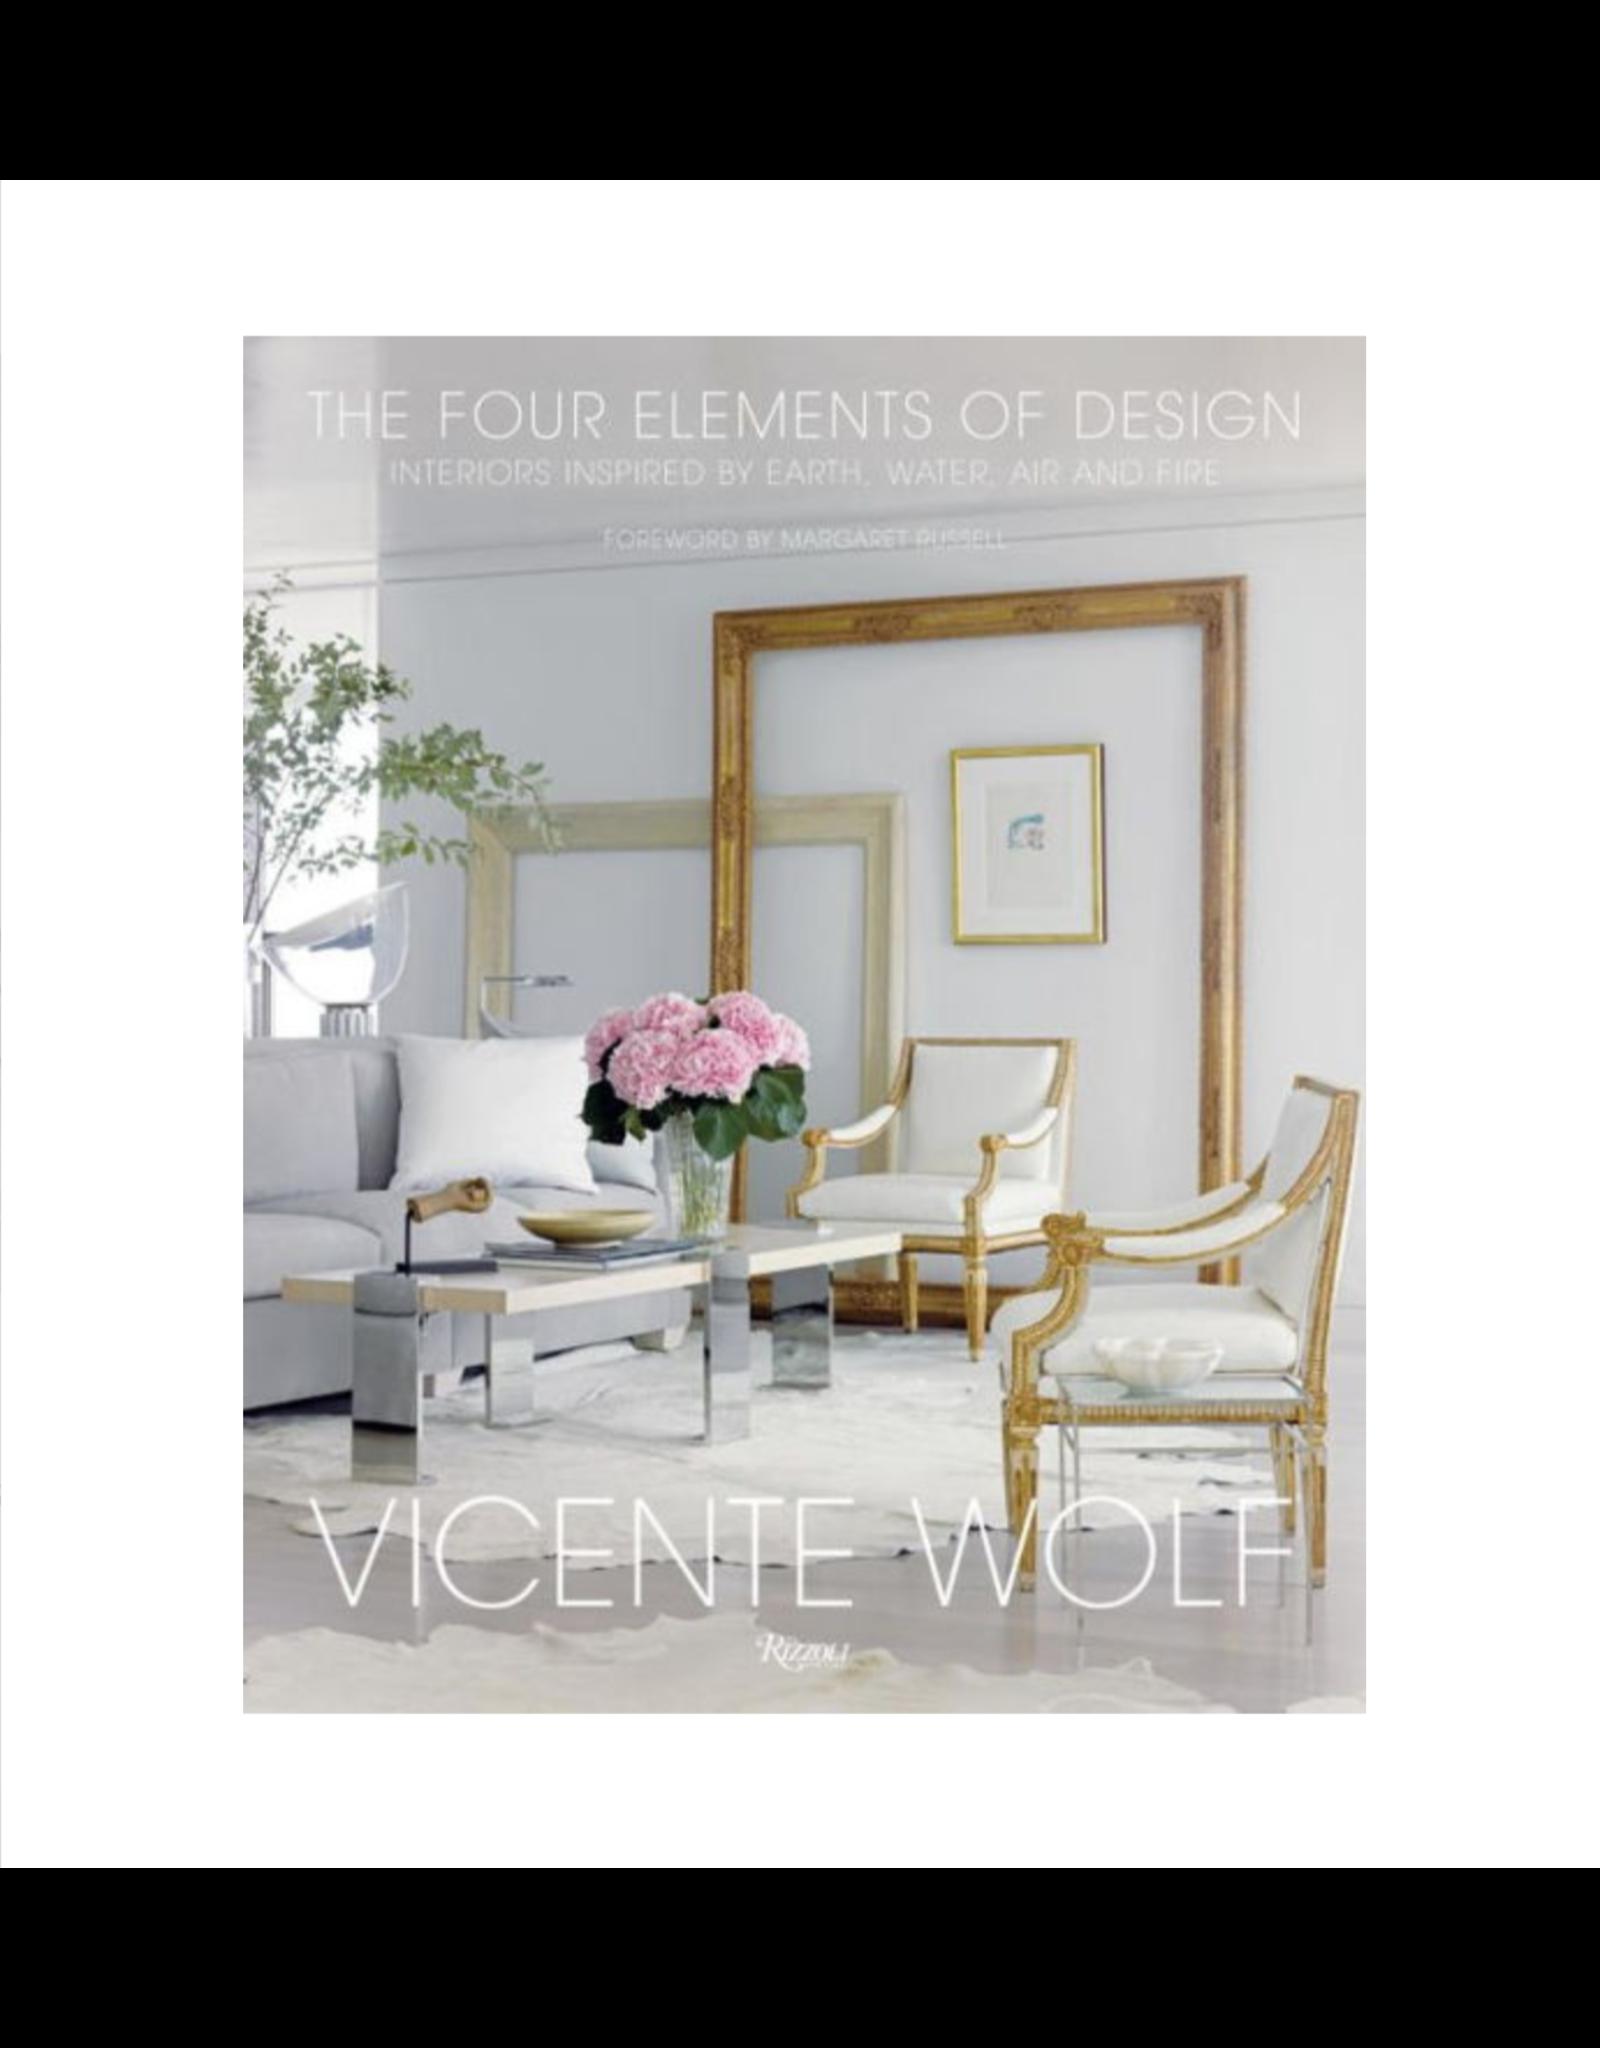 Four Elements of Design